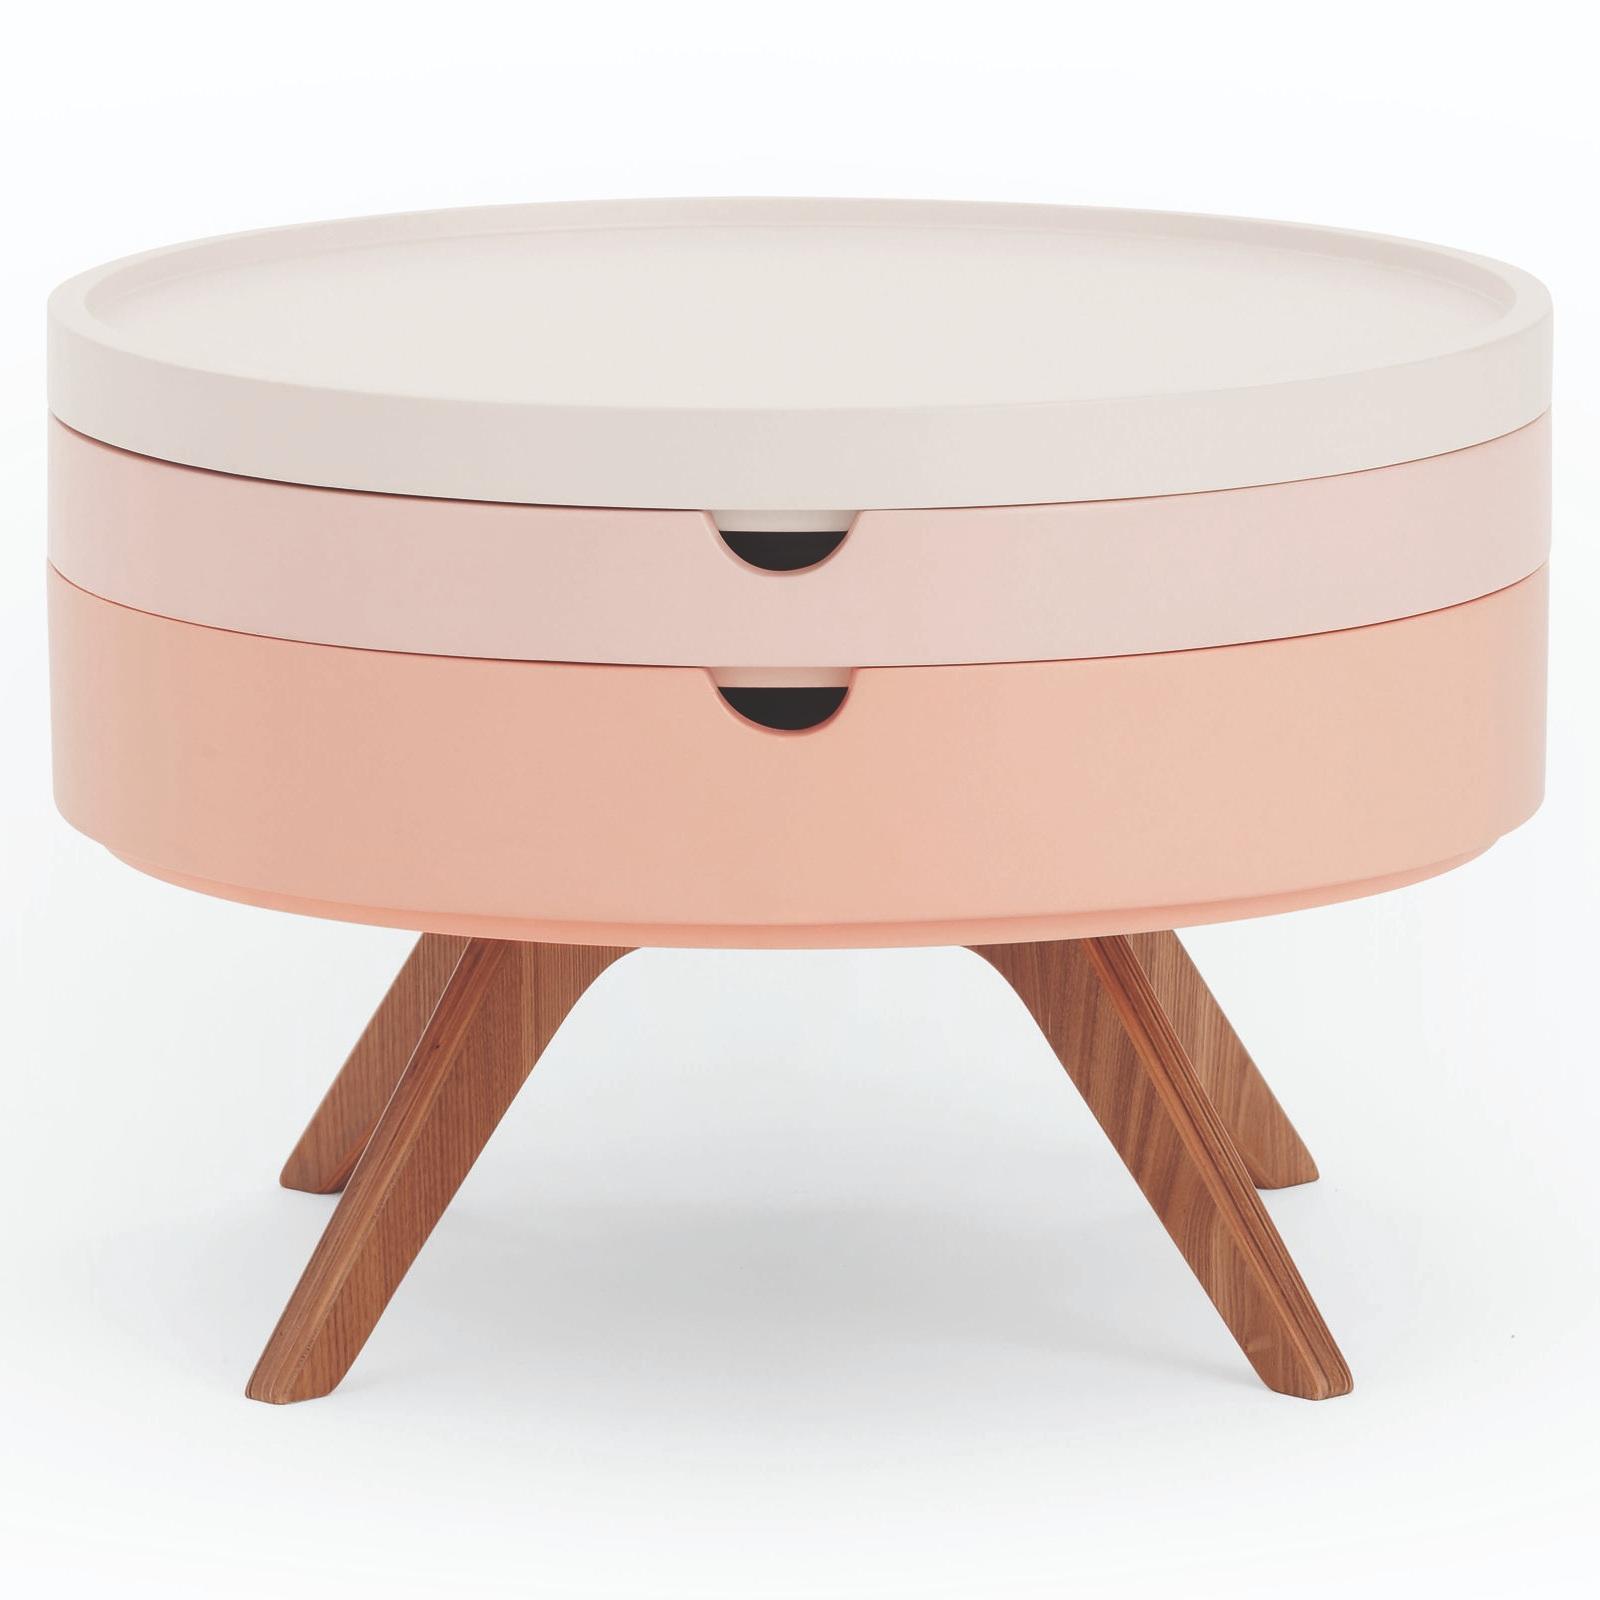 TBLCRN003PNK_UK_Cairn_Coffee_Table_Tonal_Pink_PR04.jpg